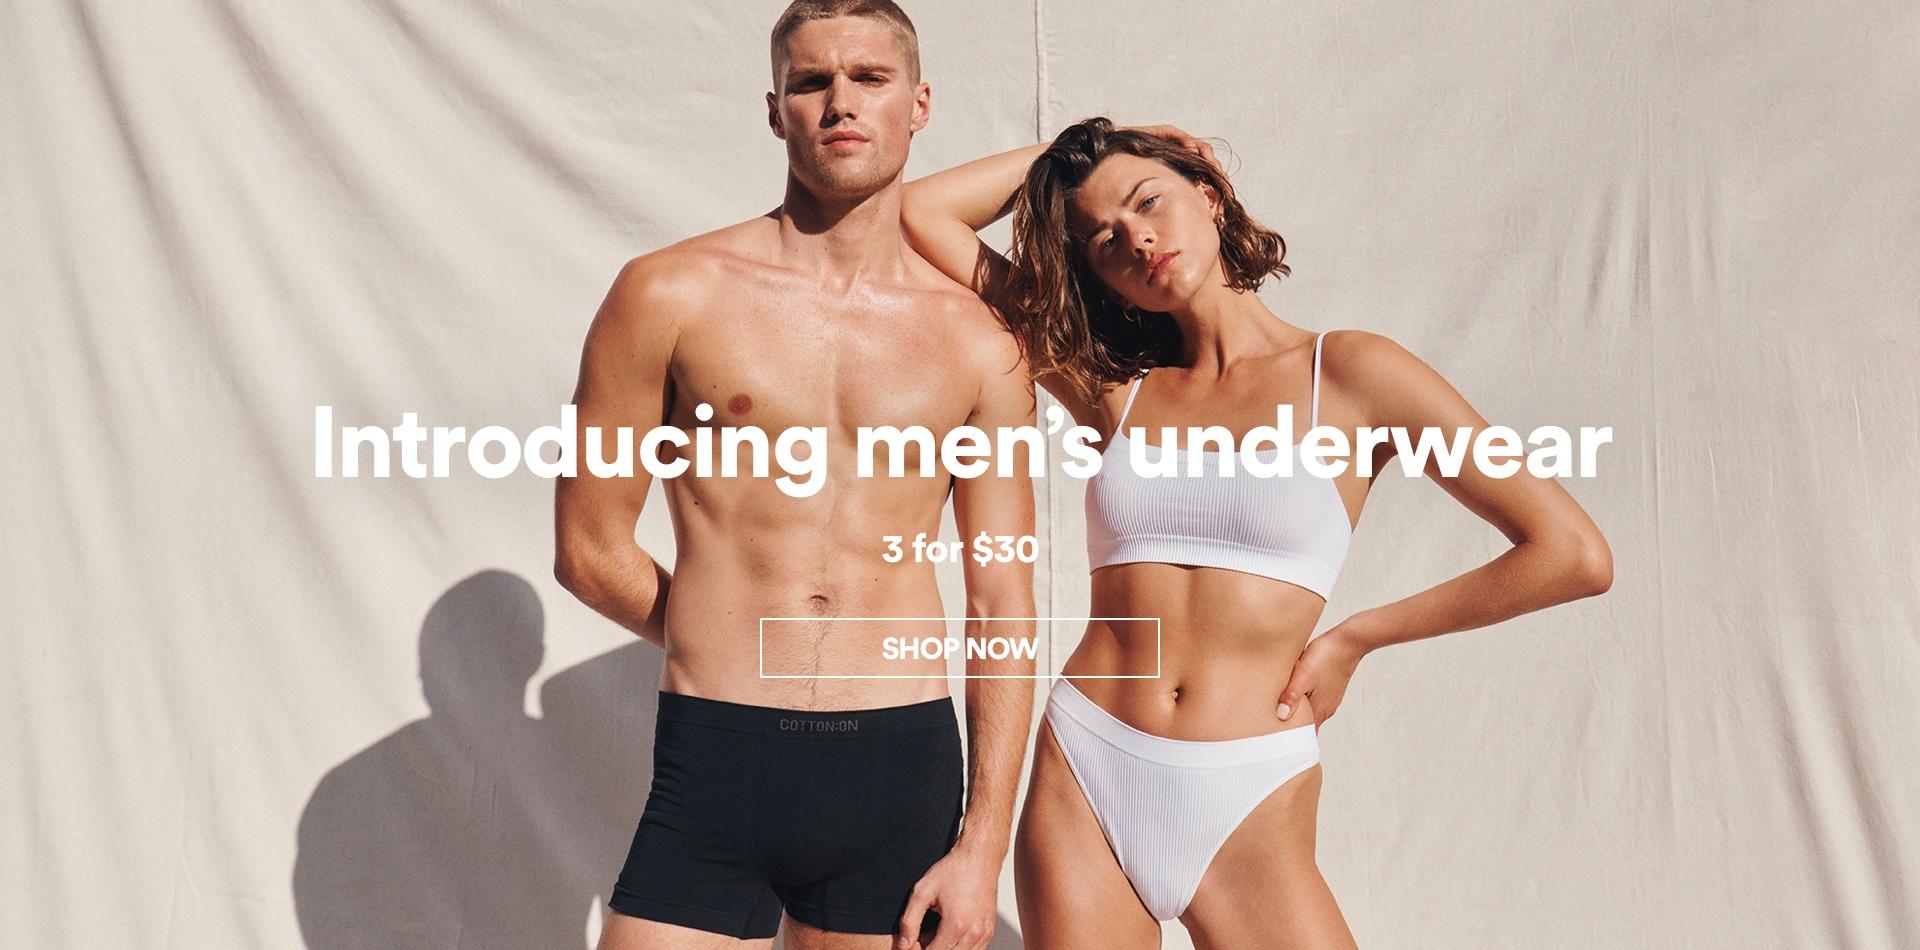 Introducing Men's Underwear. Shop Now.